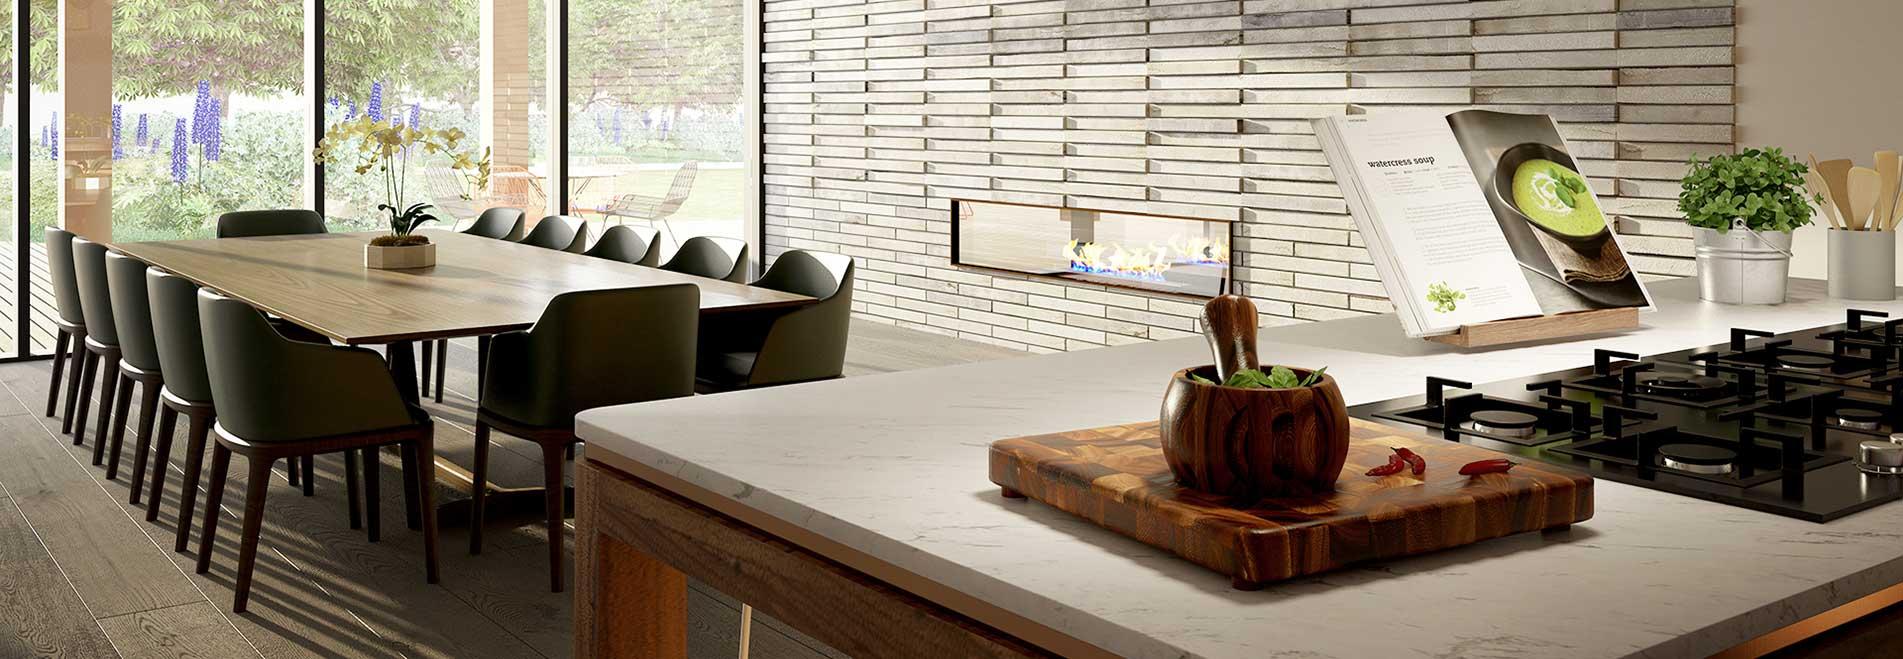 Caulfield Village – <span>Residents' kitchen & dining room</span>